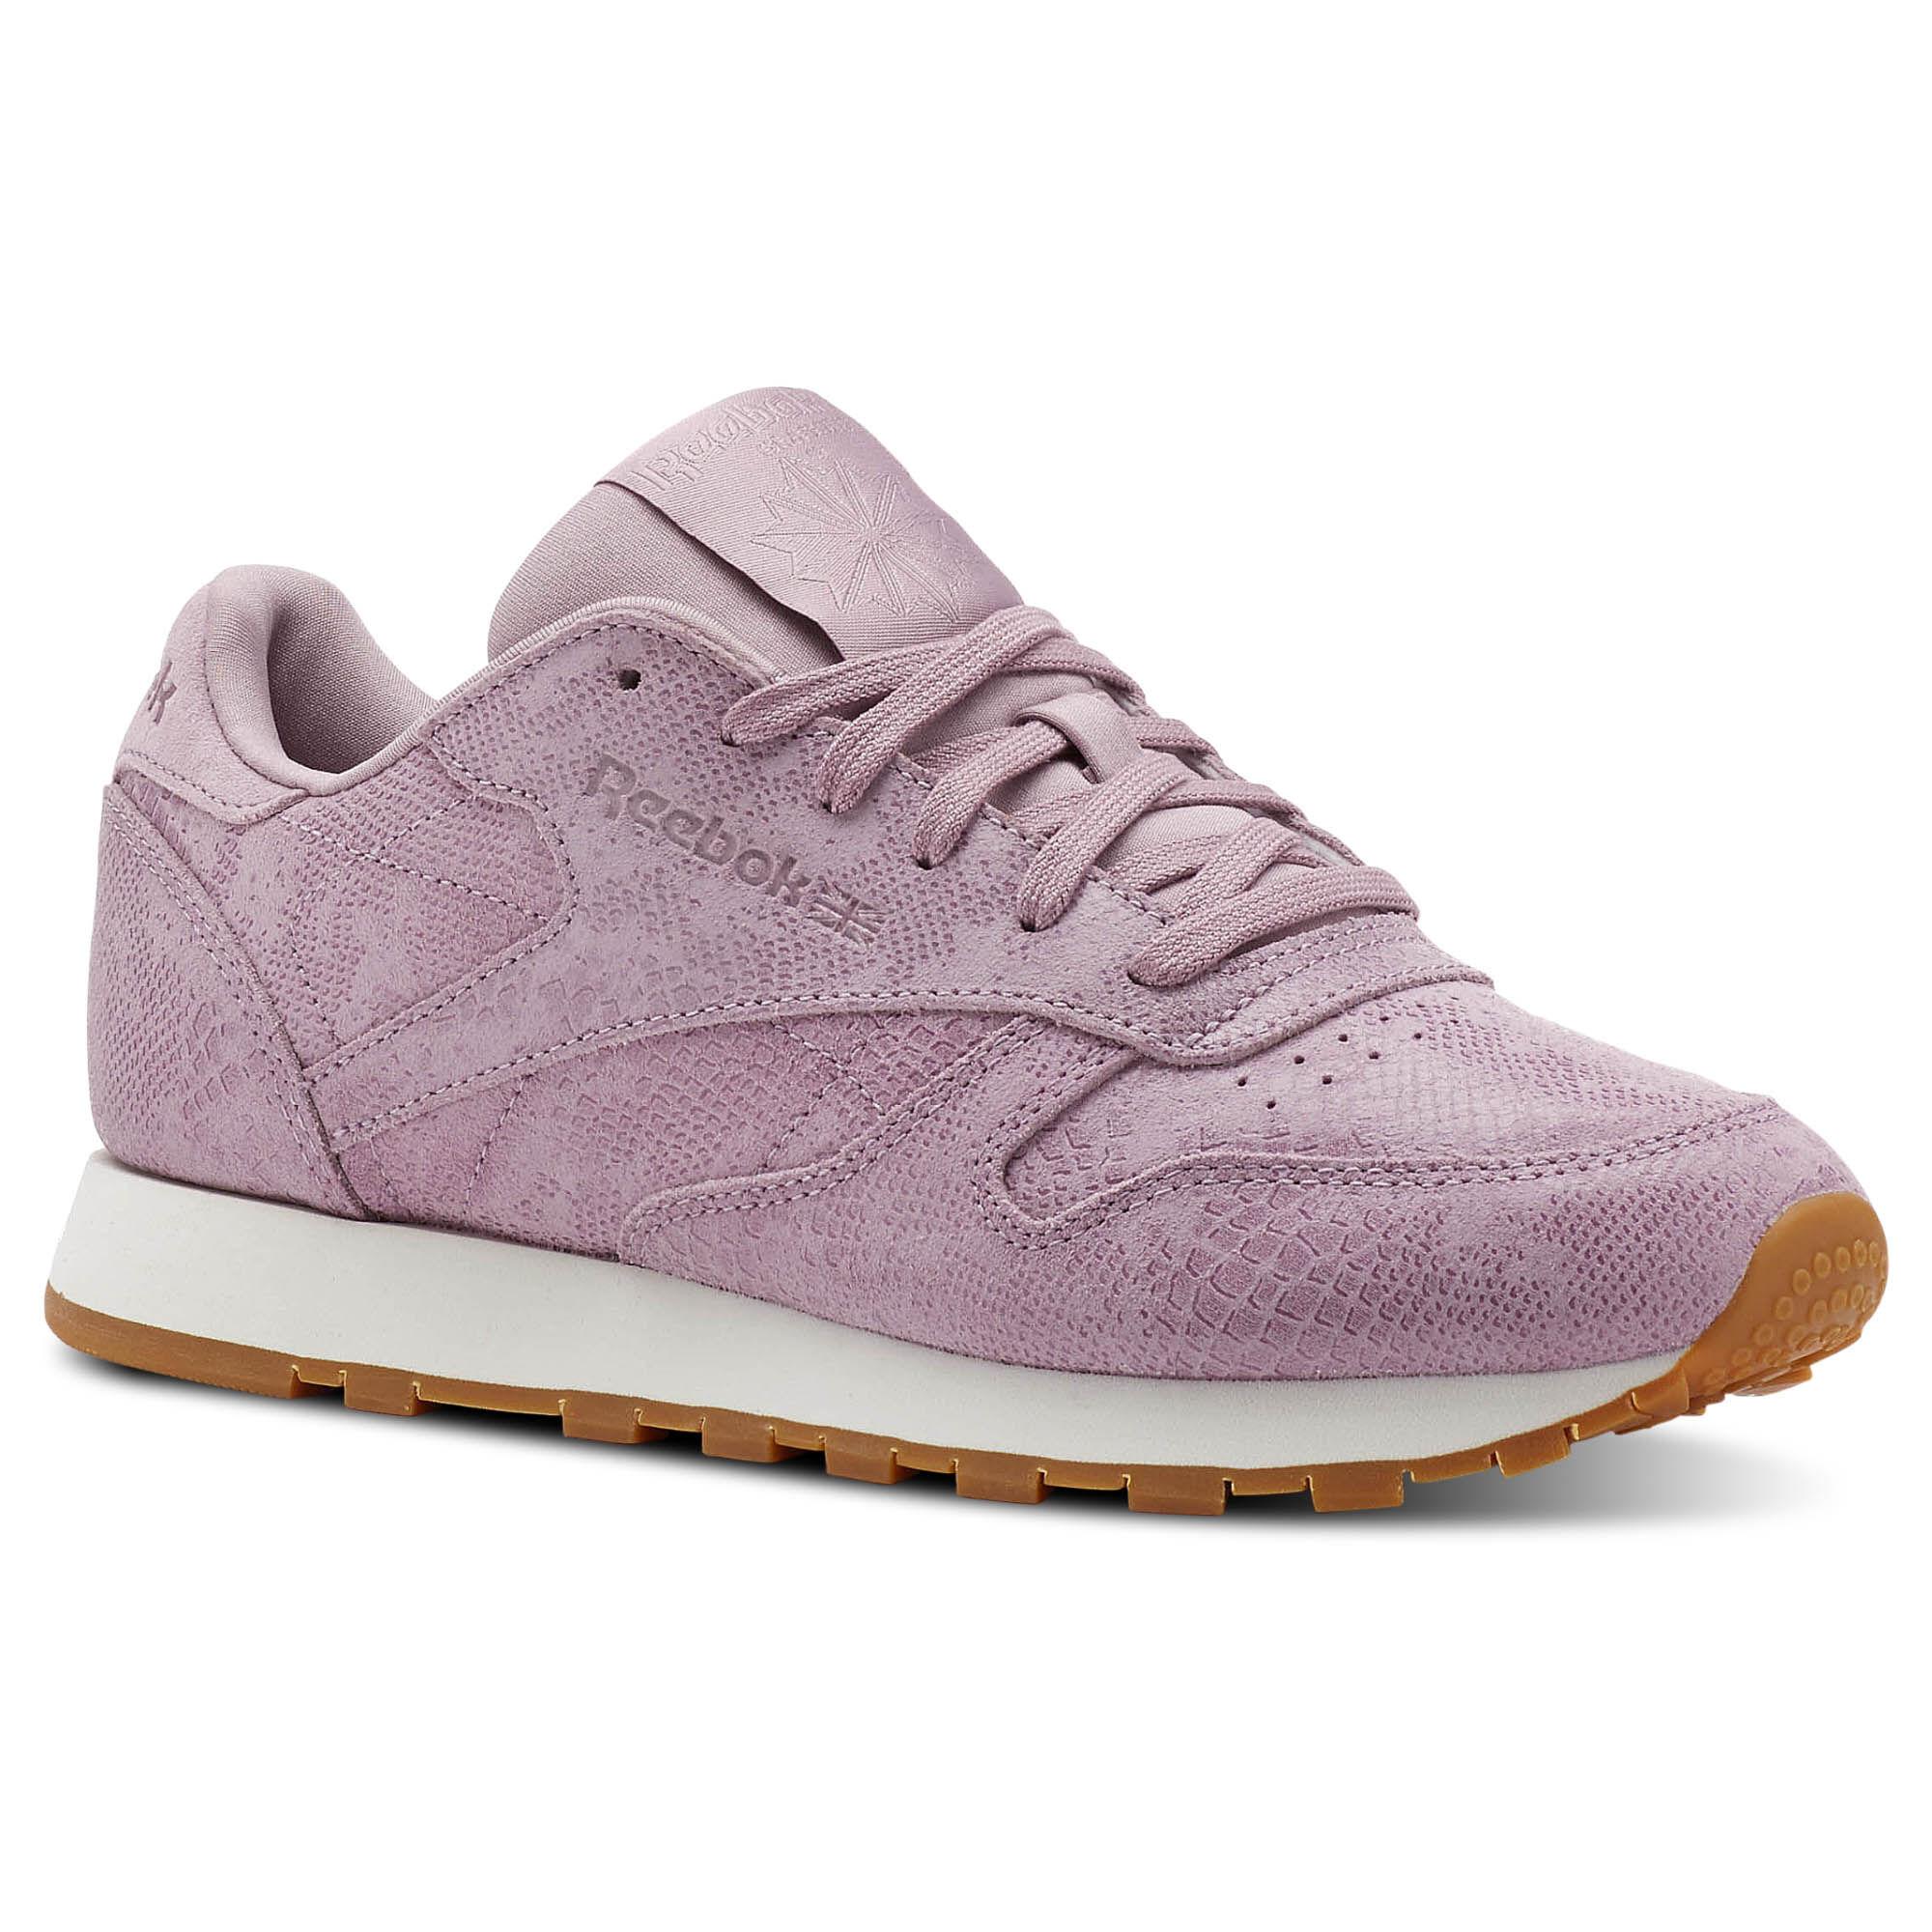 Schuhe Reebok - Cl Lthr CN4022 Chalk mTQeQ